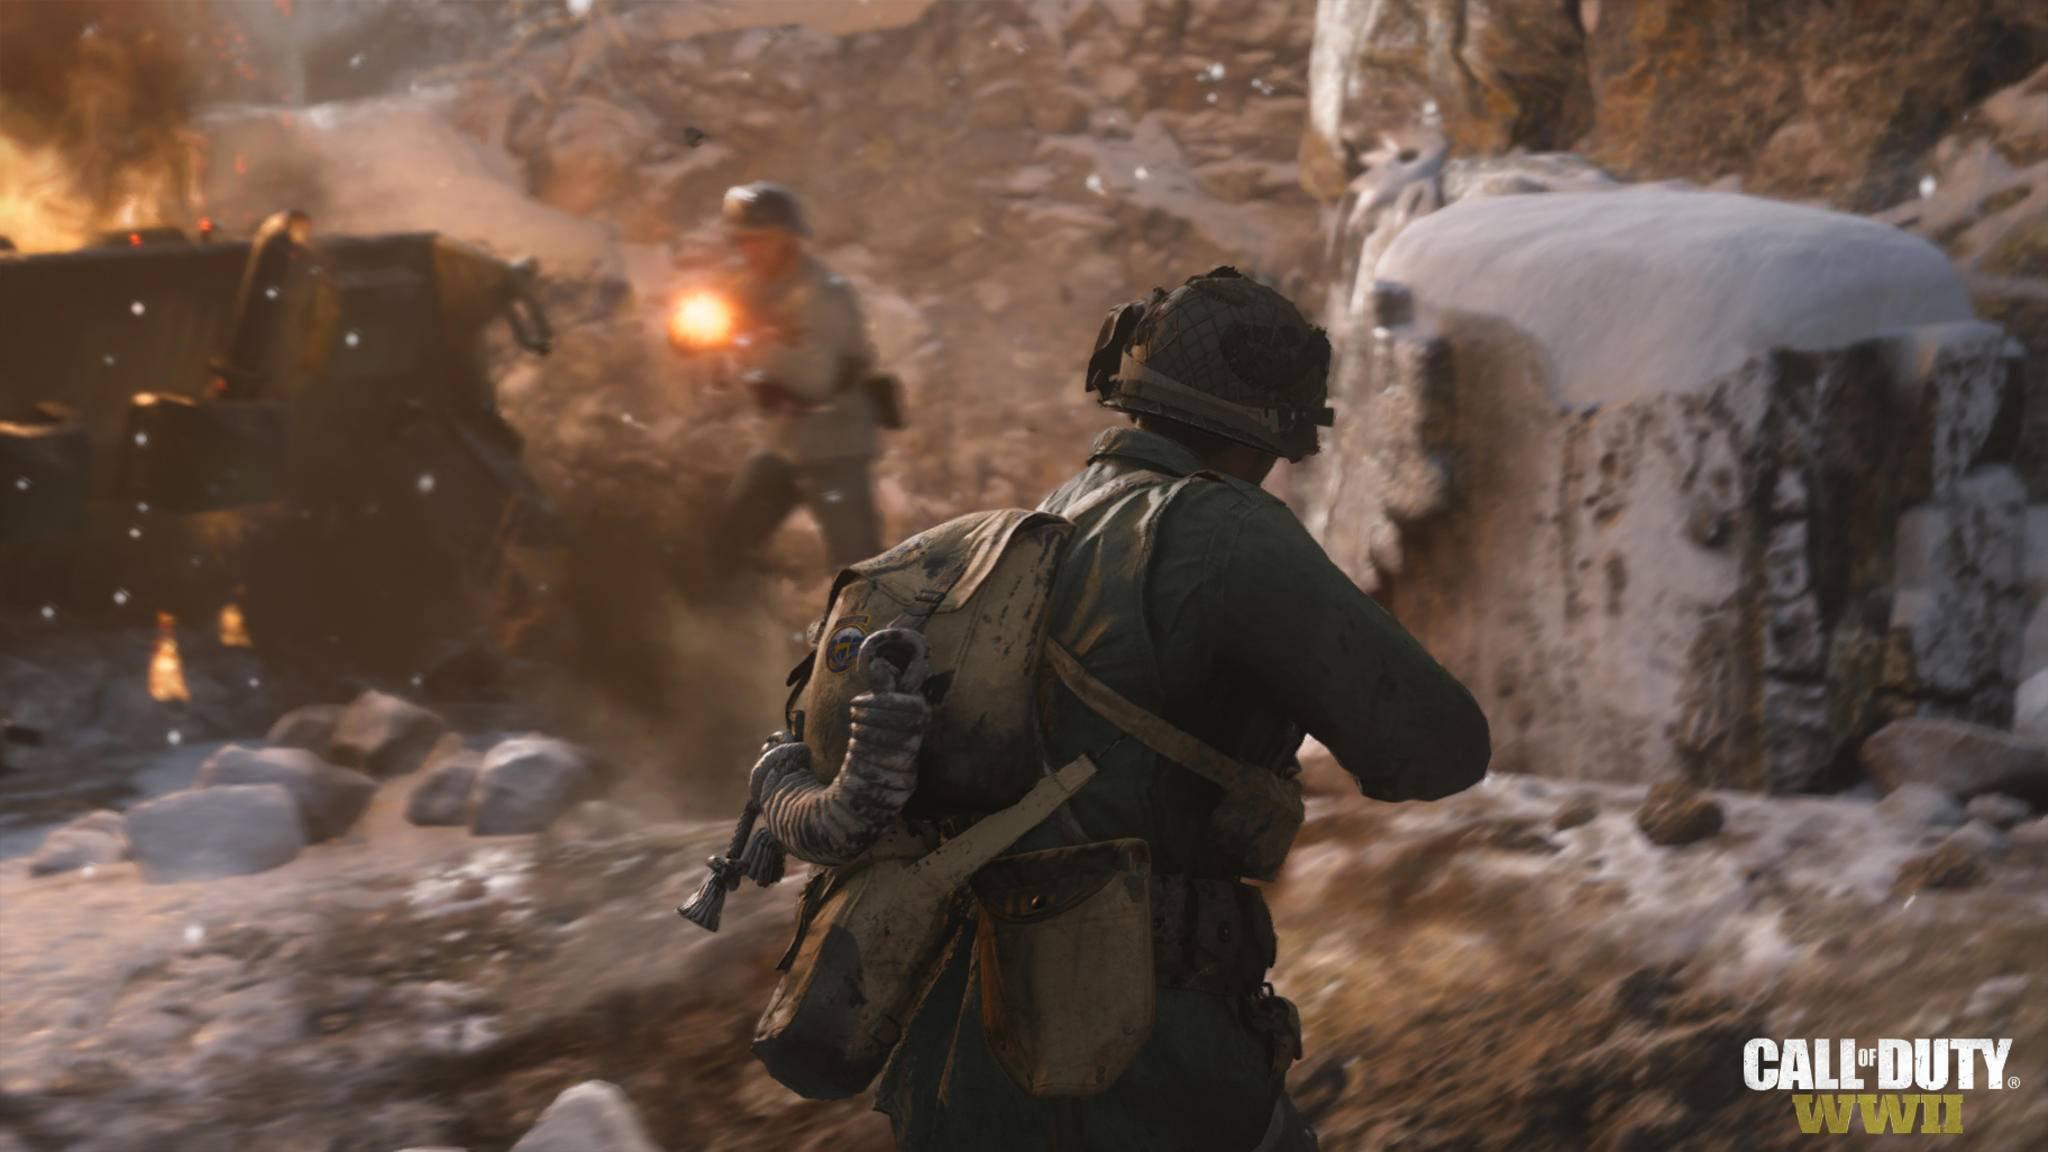 Call of Duty: WWII - Headquarters Social Space enthüllt